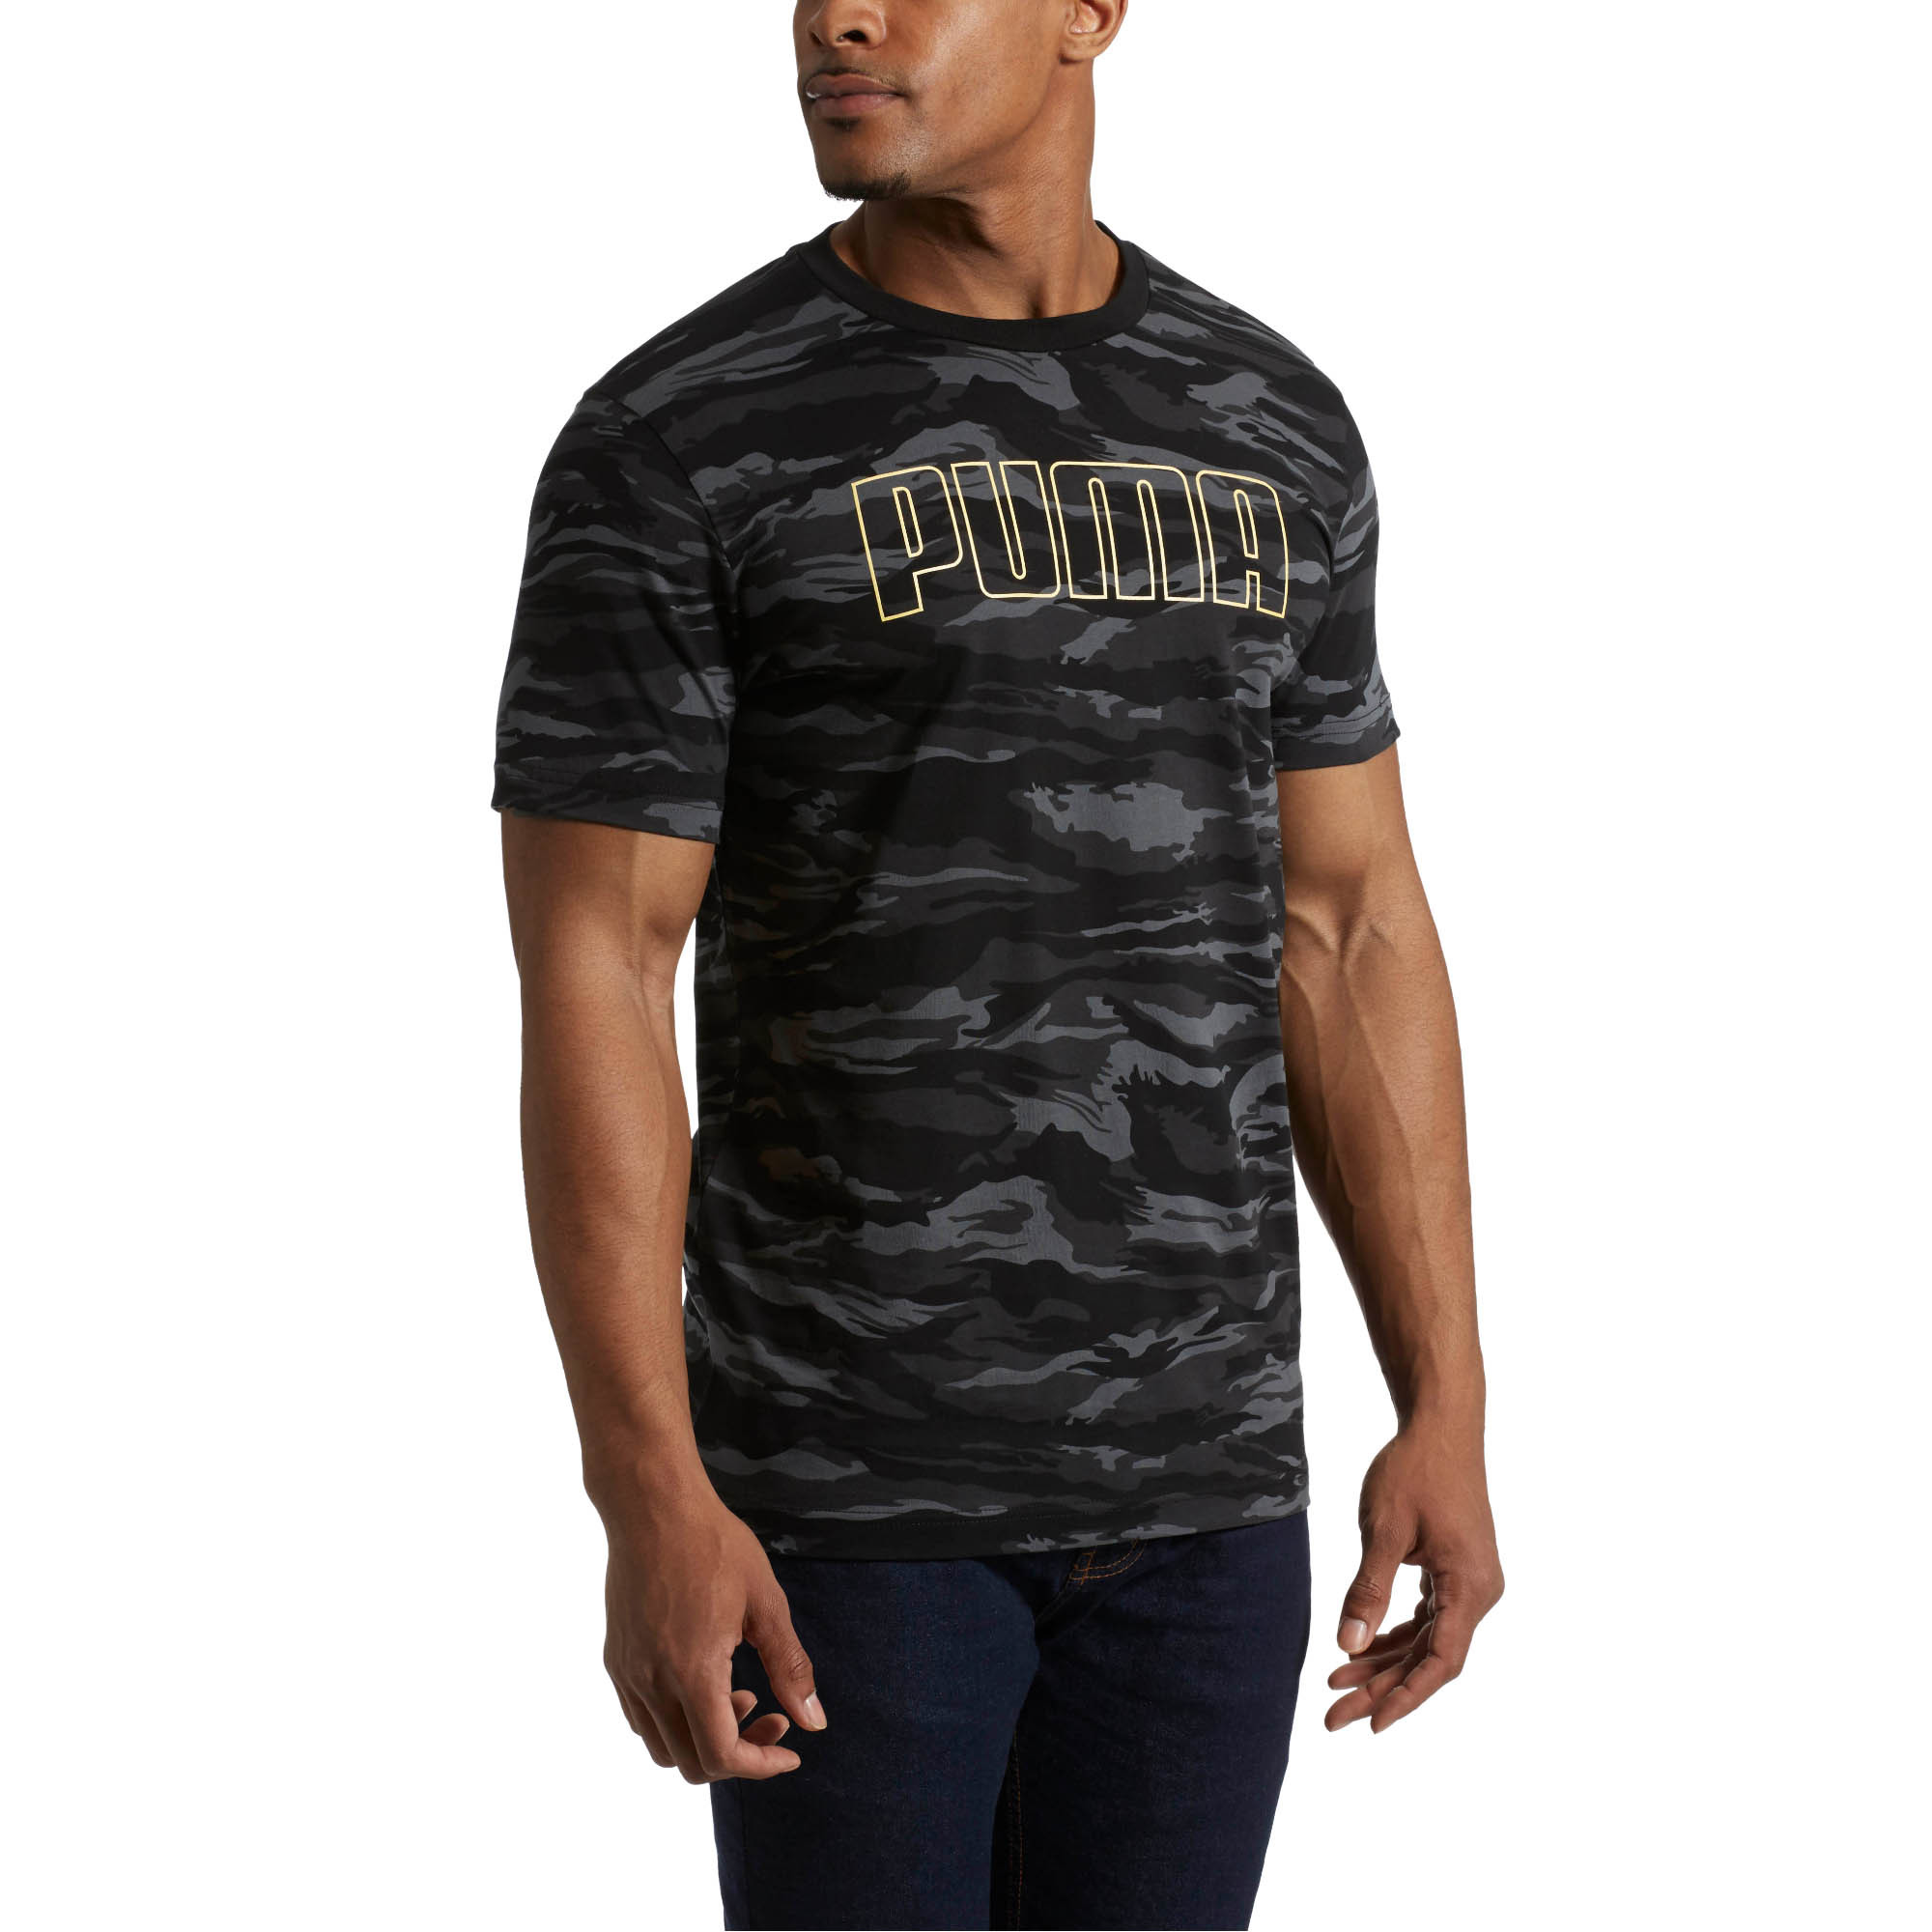 29920ab9a3 Details about PUMA Camo AOP T-Shirt Men Tee Basics